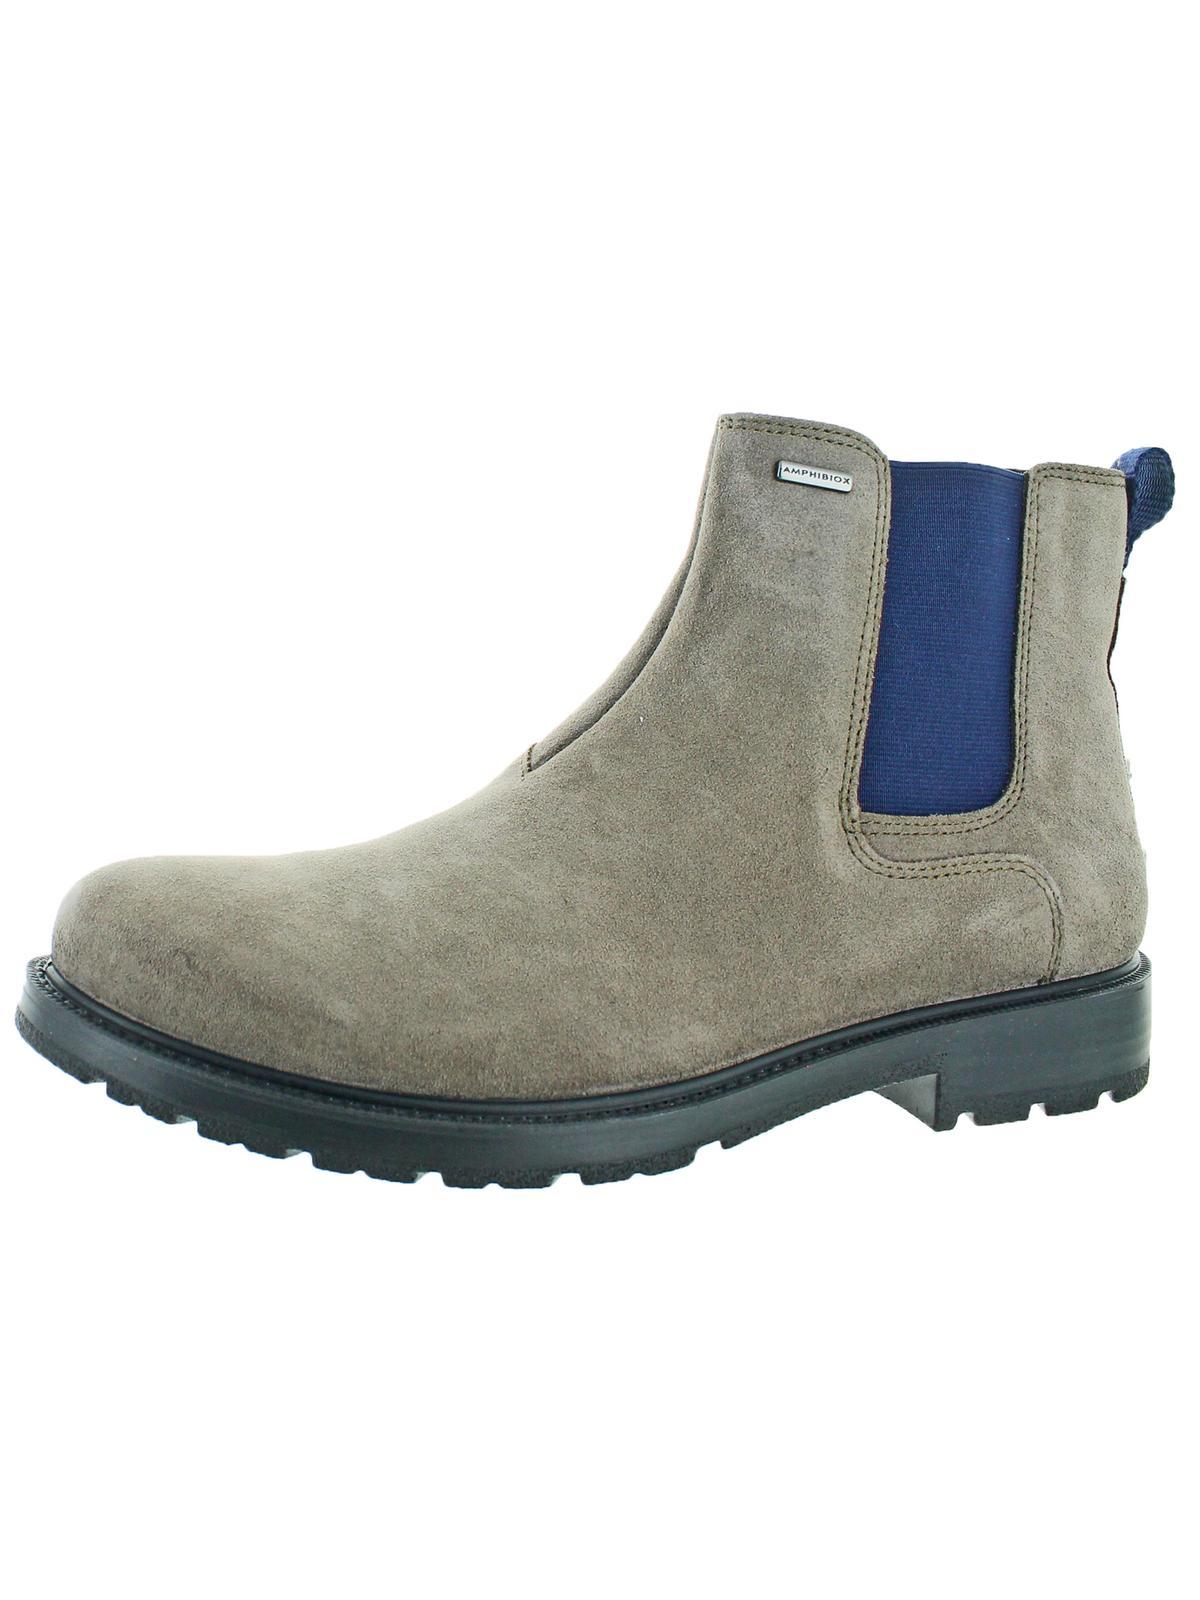 Geox Mens Fiesole Suede Waterproof Chelsea Boots